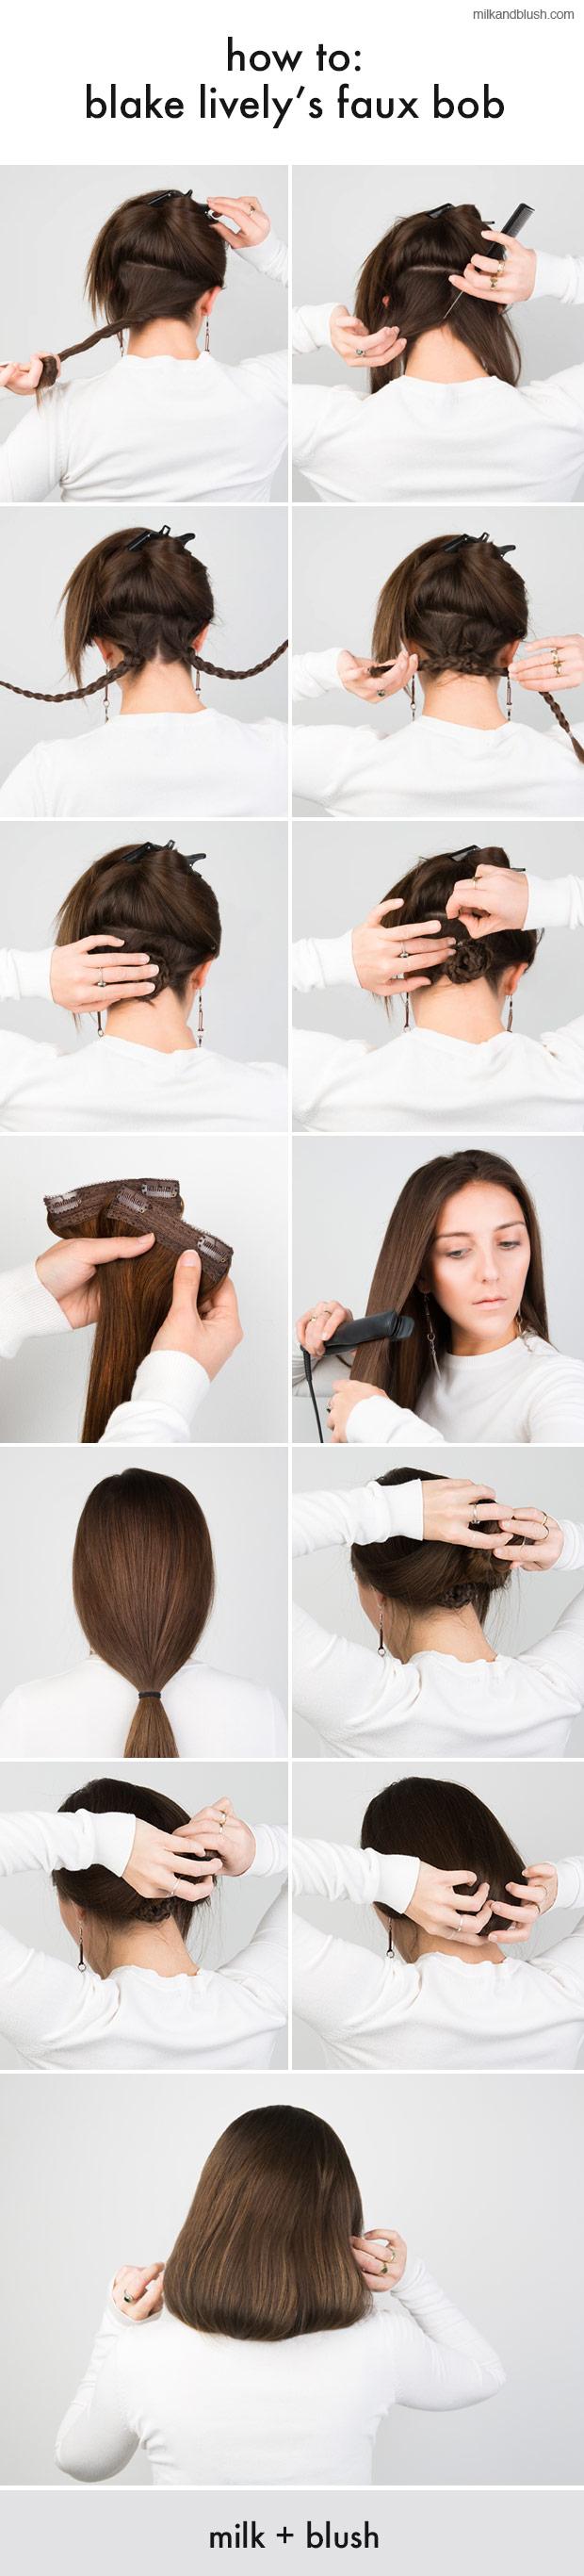 How To Blake Livelys Faux Bob Hair Extensions Blog Hair